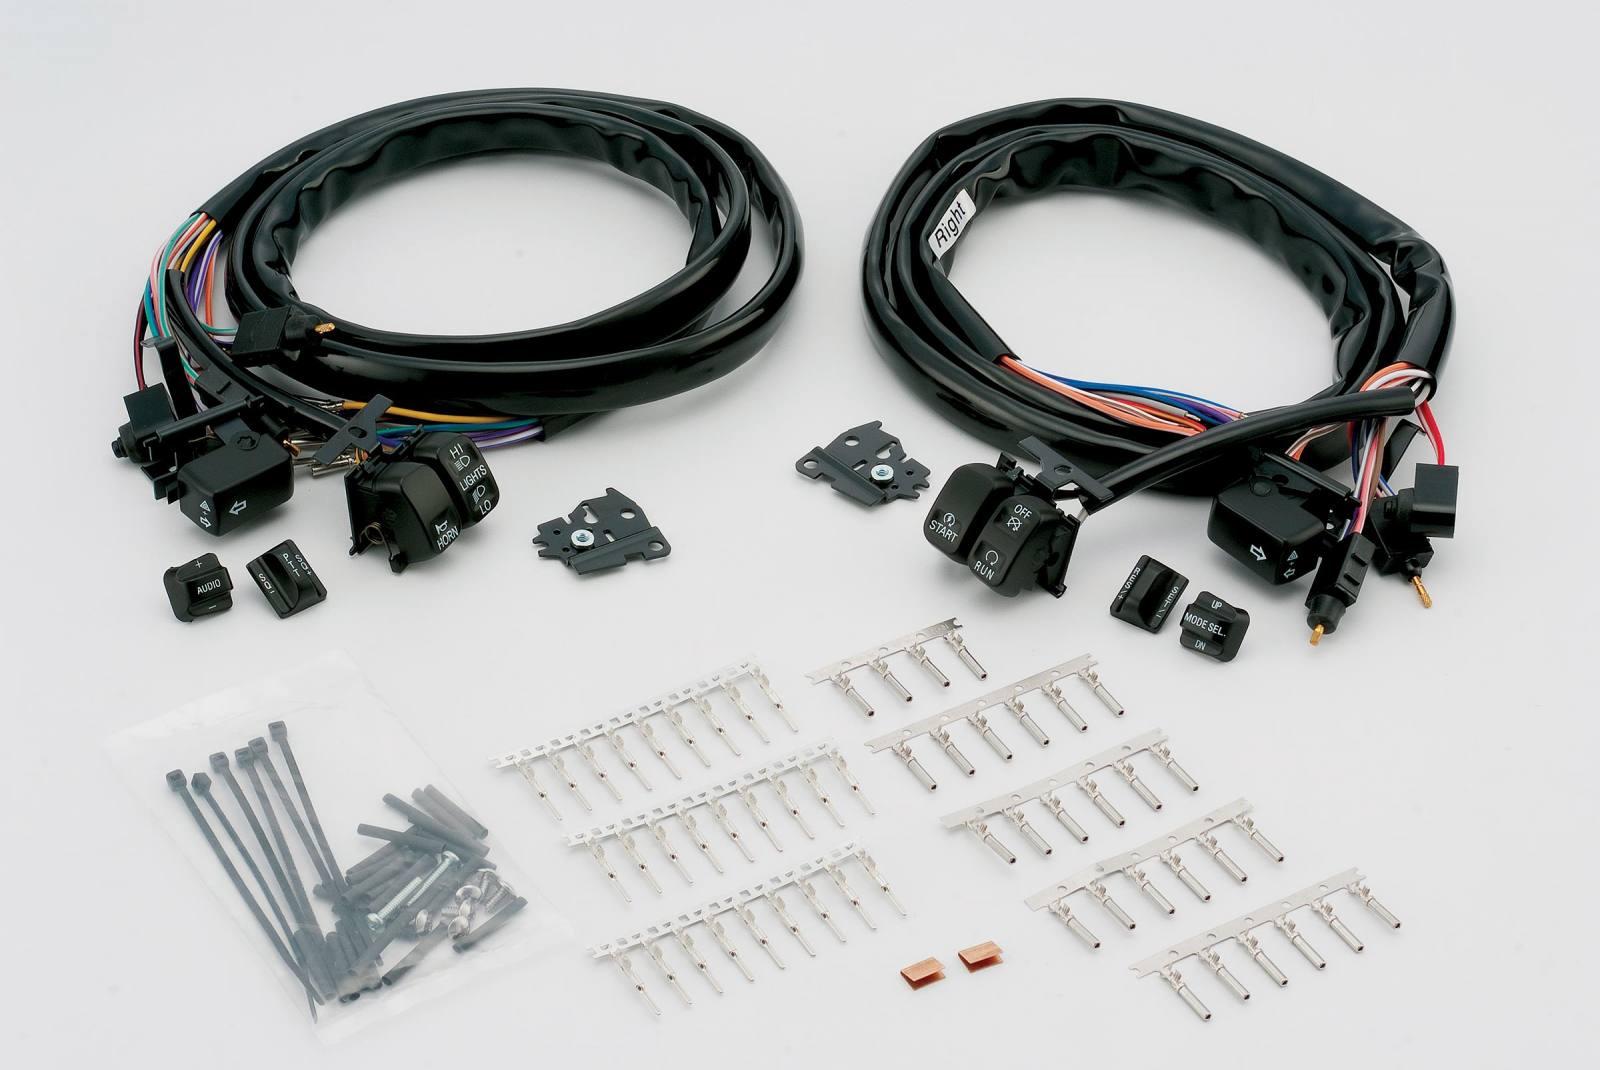 2001 ez go txt wiring diagram area lighting research photocell 36 volt color 2002 ezgo pioneer